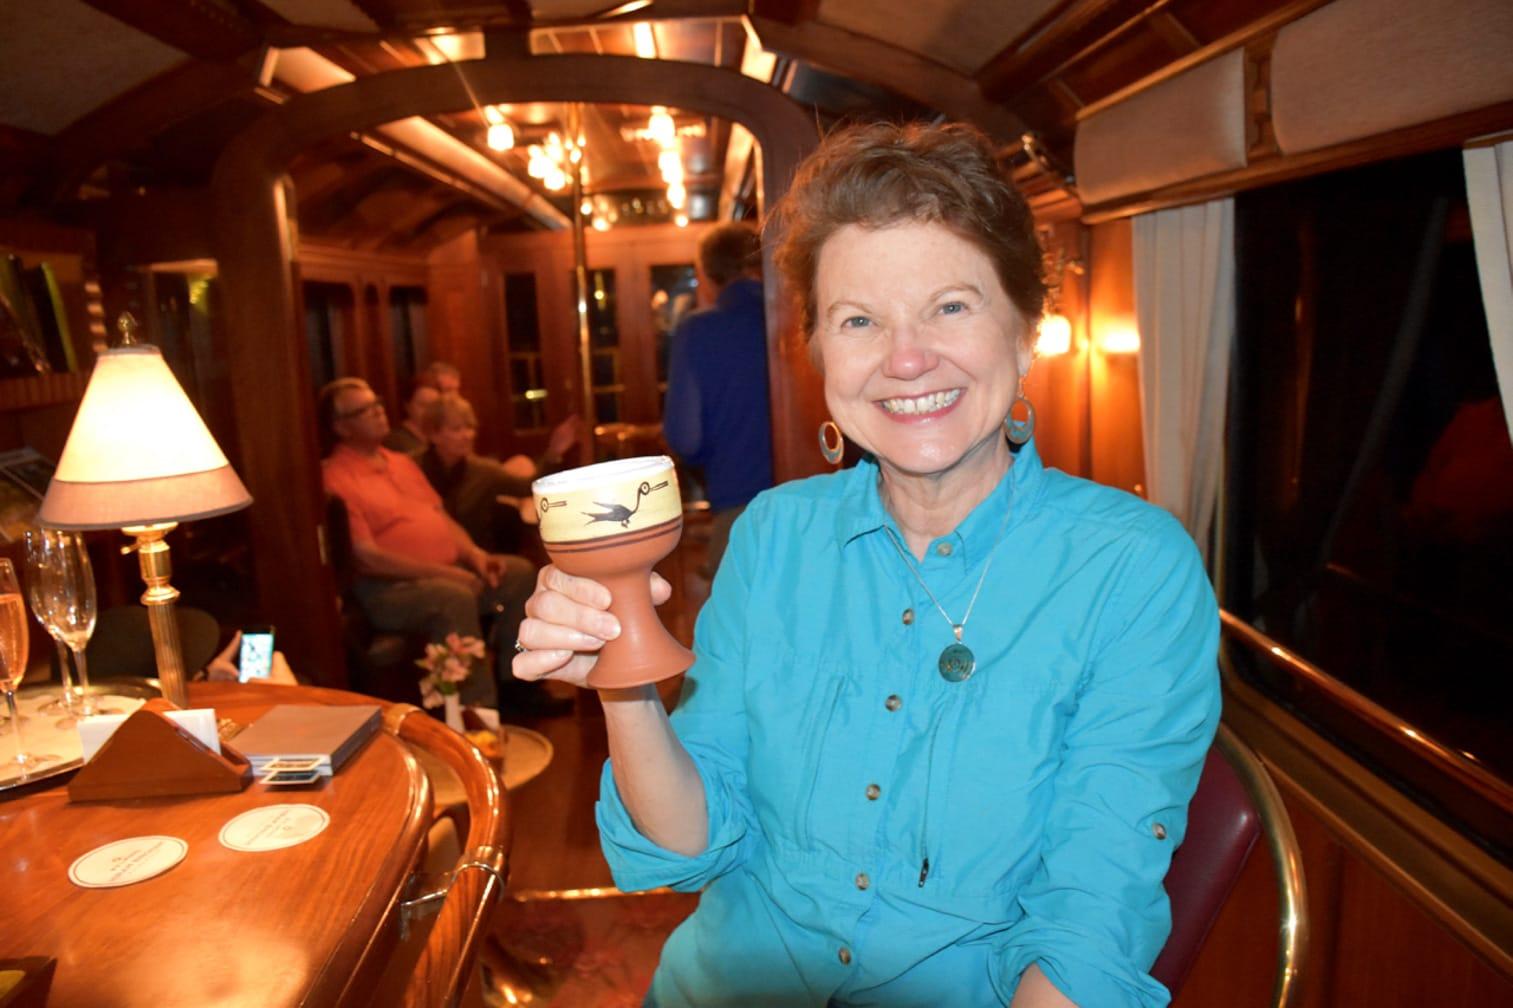 Female guest holding a drink on the Belmond Hiram Bingham train